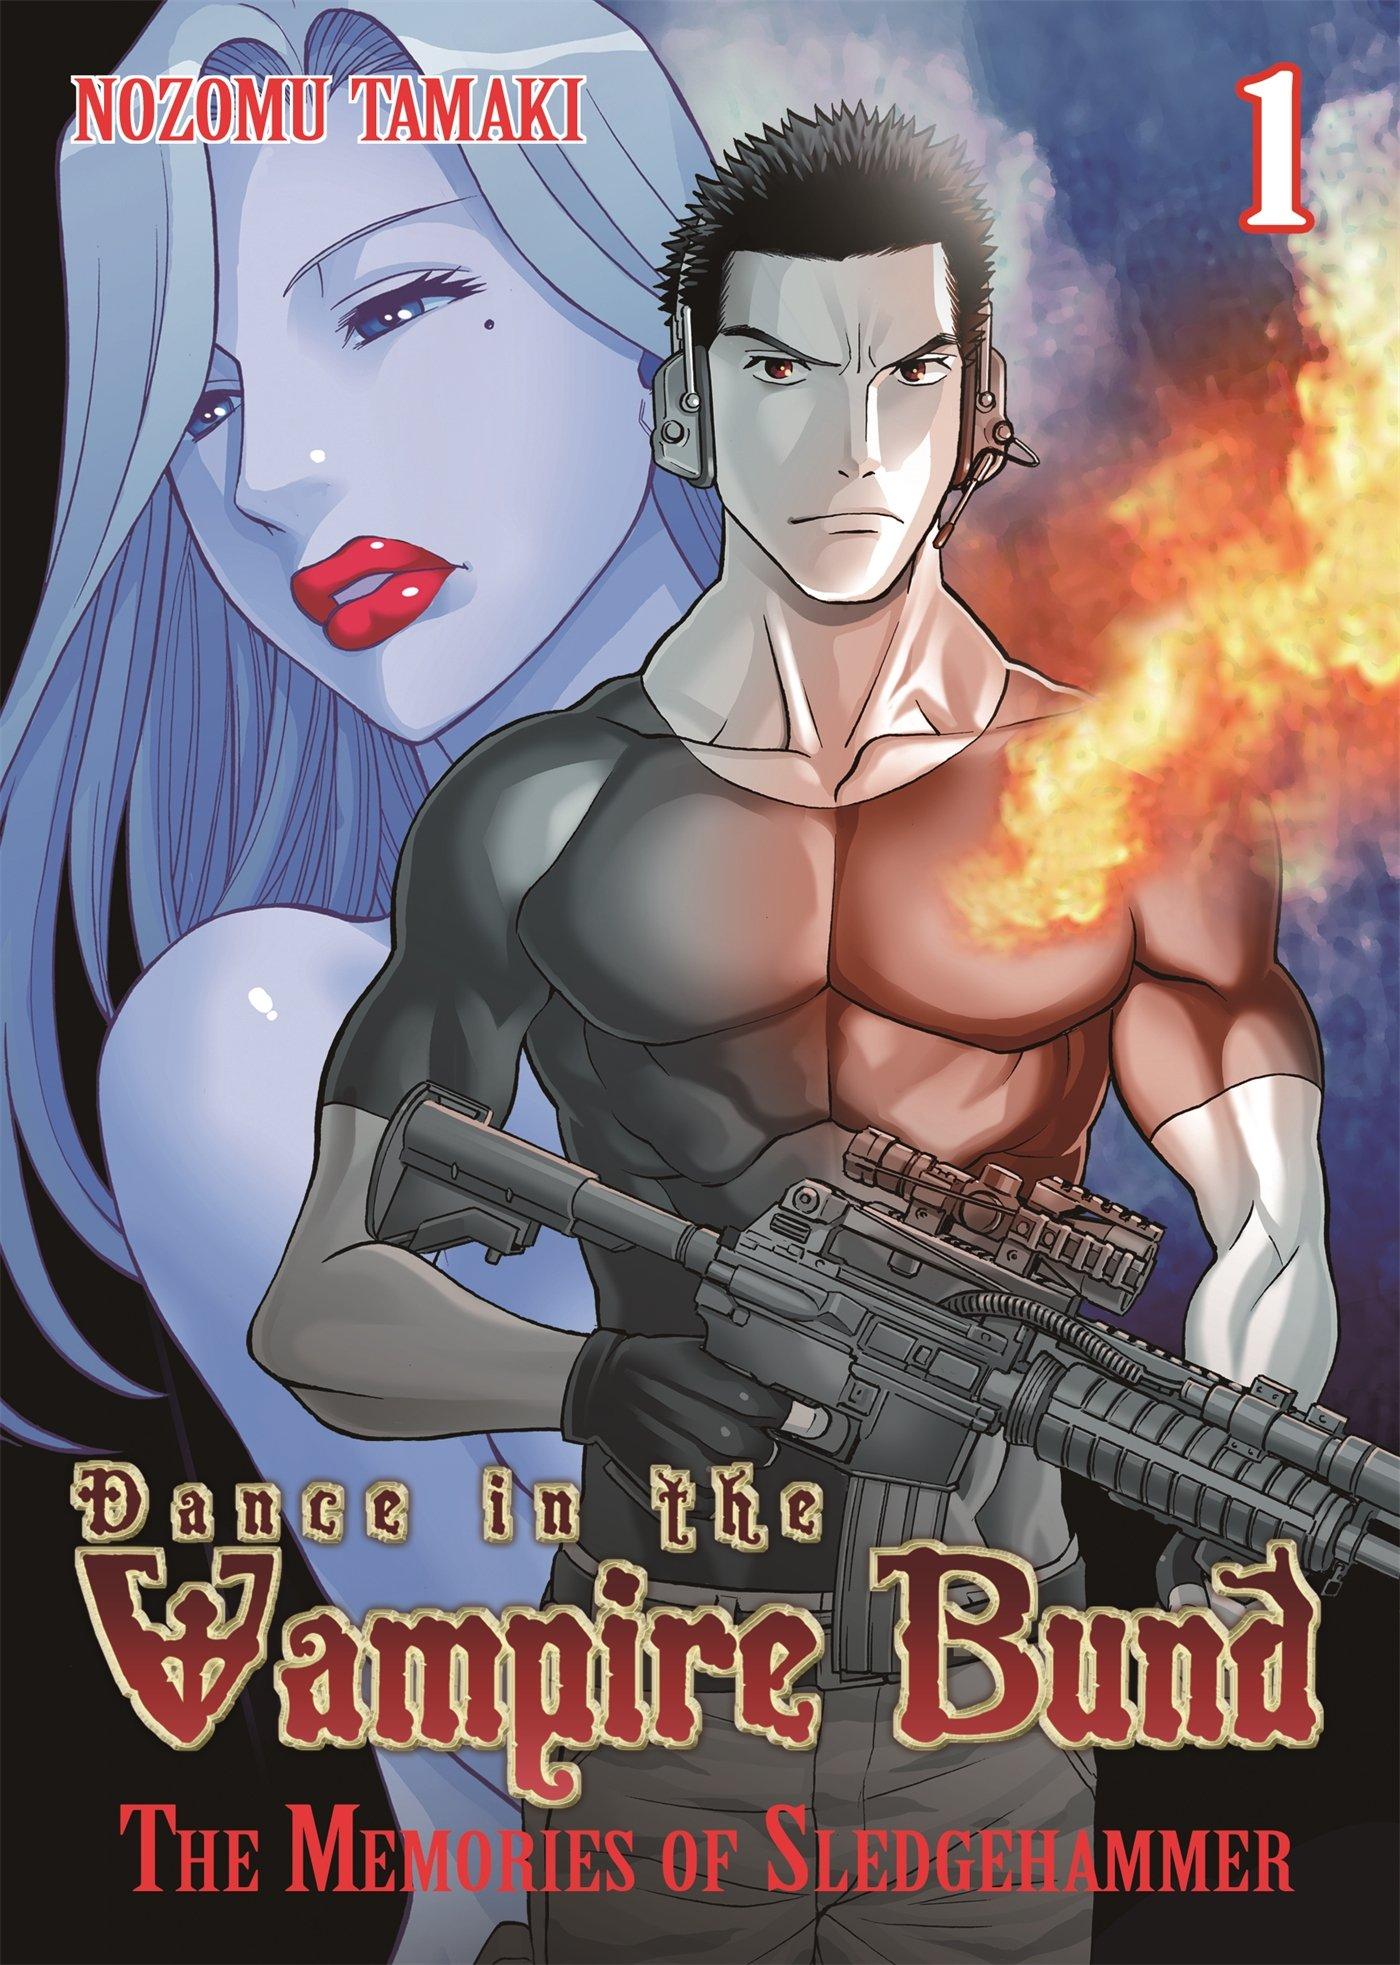 Dance in the Vampire Bund  The Memories of Sledge Hammer Vol. 1  Nozomu  Tamaki  9781626920194  Amazon.com  Books 92c7636d77